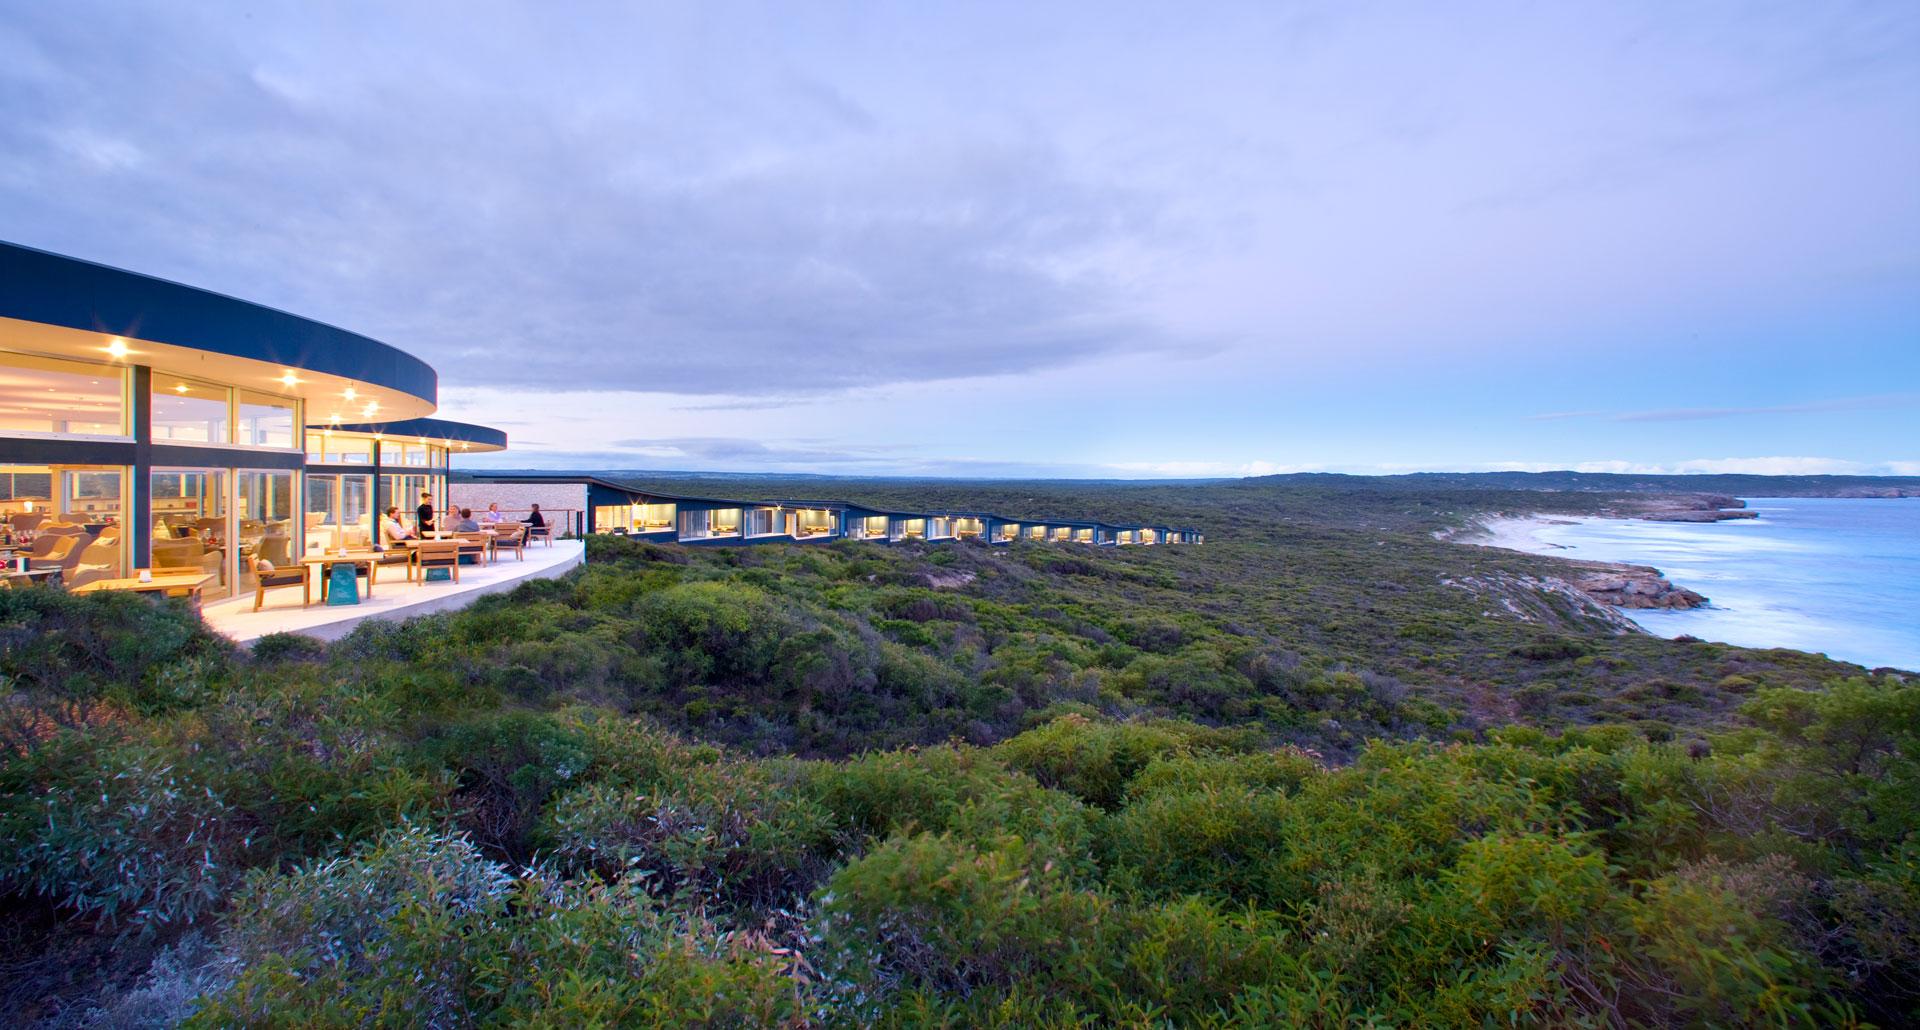 Southern Ocean Lodge - boutique hotel in Kangaroo Island